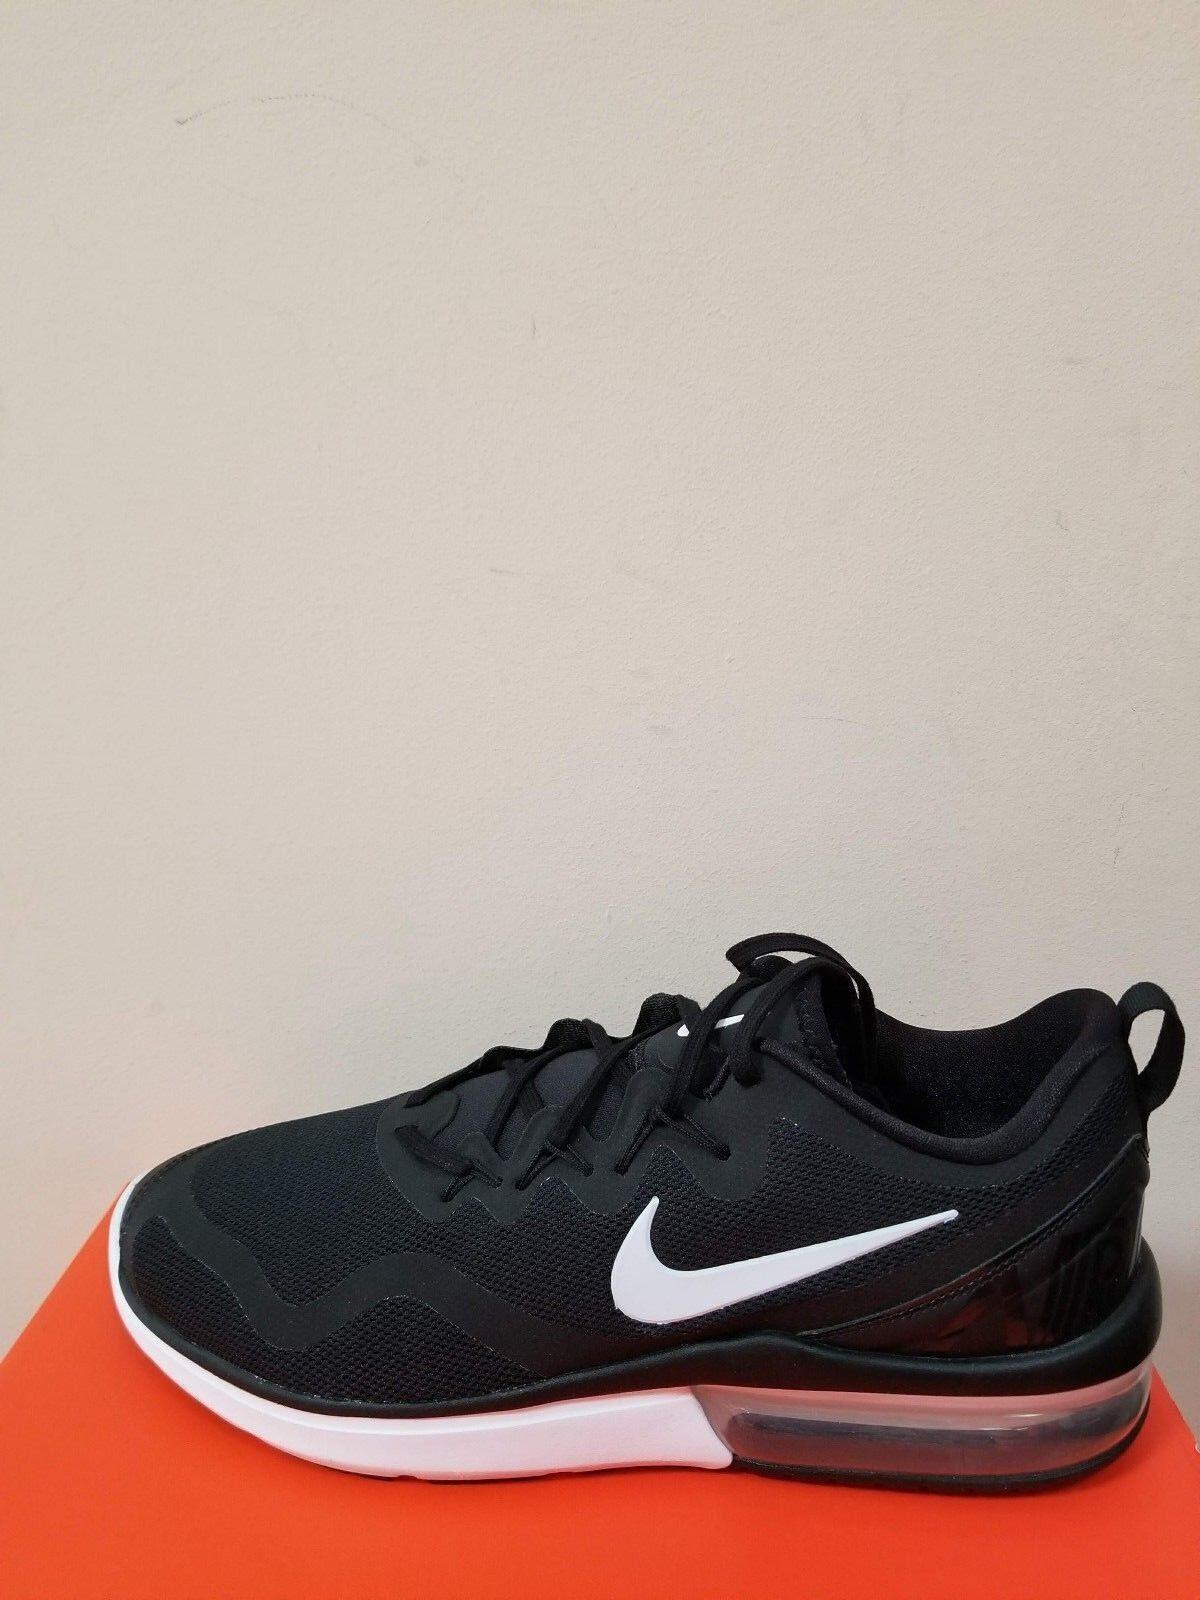 Nike Air Max Fury Running Shoes Size 10.5 NIB